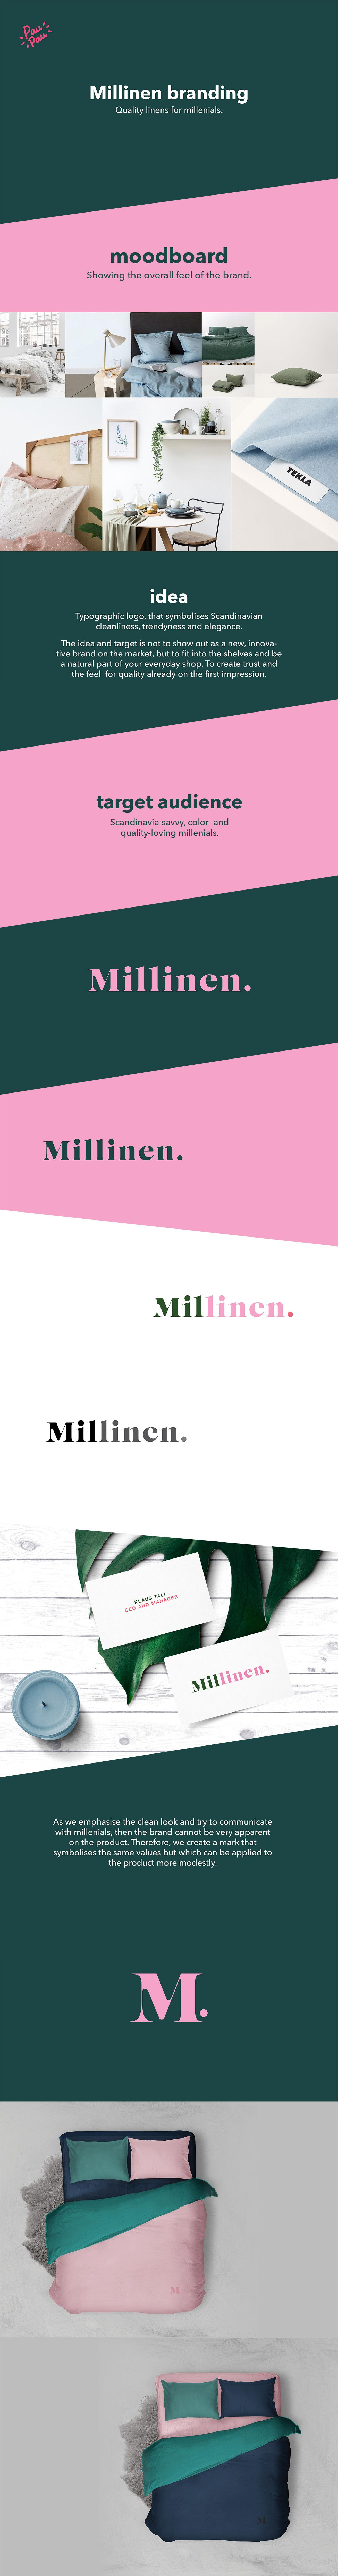 product design  linen brand Scandinavian Scandinavia Design Clean Design brand identity trendy millenials brands for millenials color